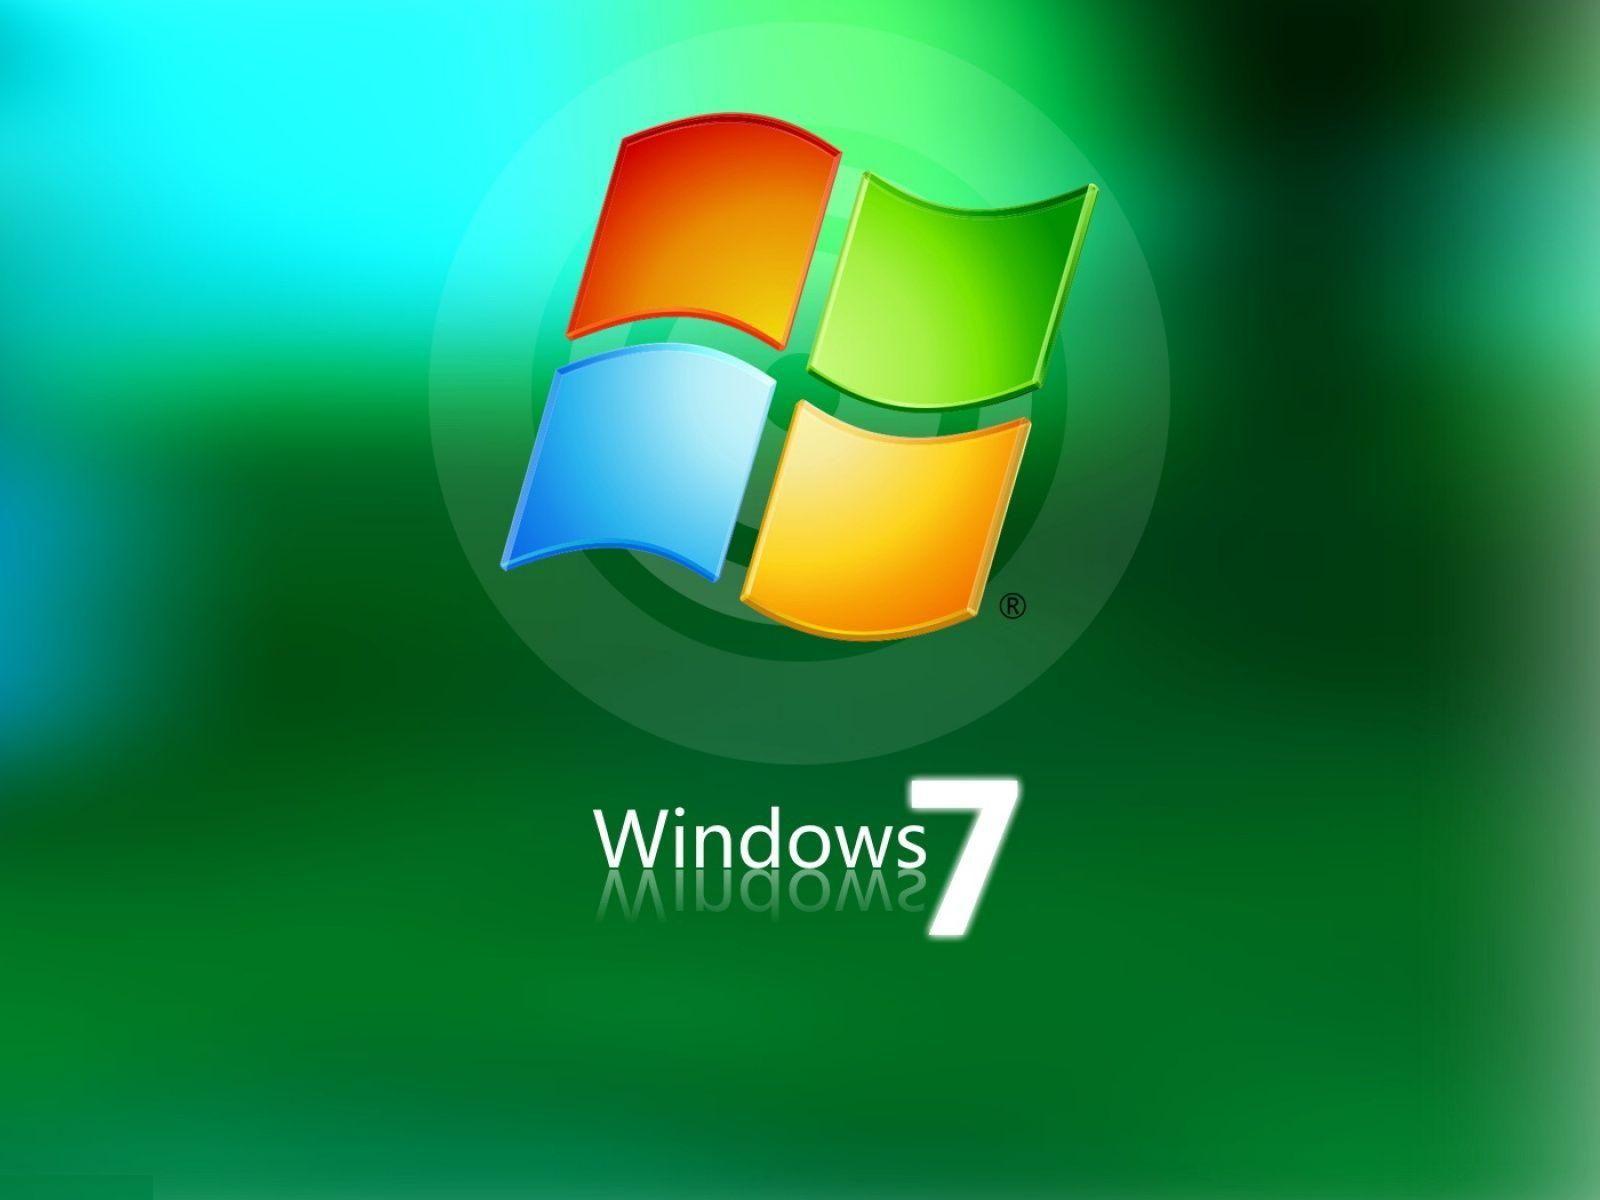 Windows 7 Wallpapers Http Www Firsthdwallpapers Com Windows 7 Wallpapers Html Desktop Wallpapers Backgrounds Backgrounds Desktop Windows